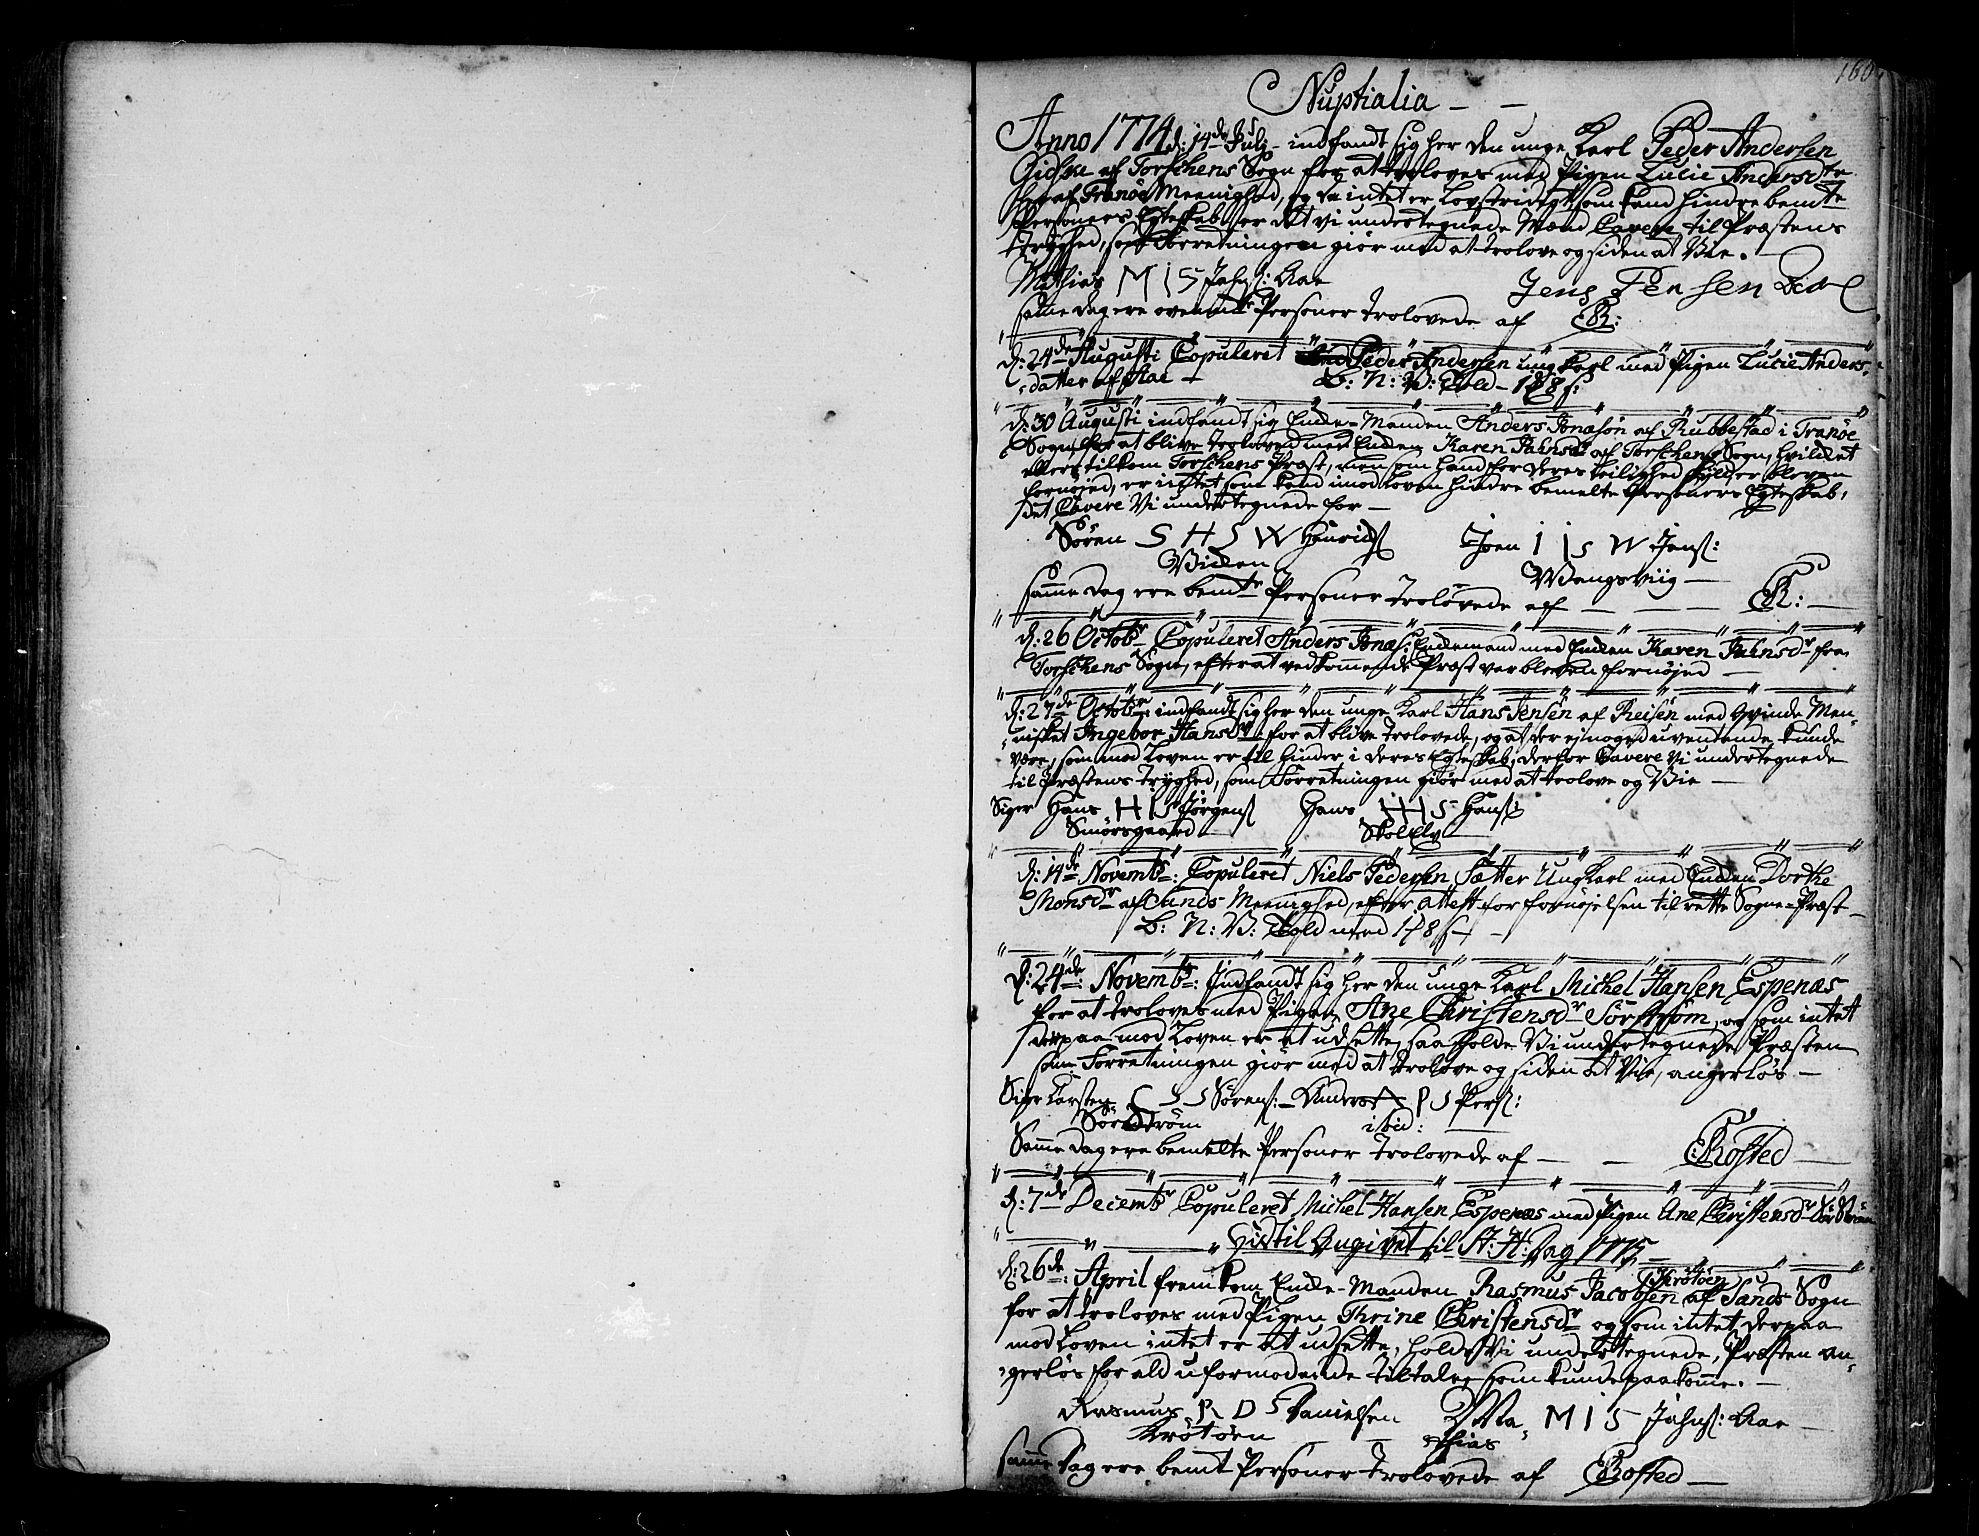 SATØ, Tranøy sokneprestkontor, I/Ia/Iaa/L0002kirke: Ministerialbok nr. 2, 1773-1806, s. 160